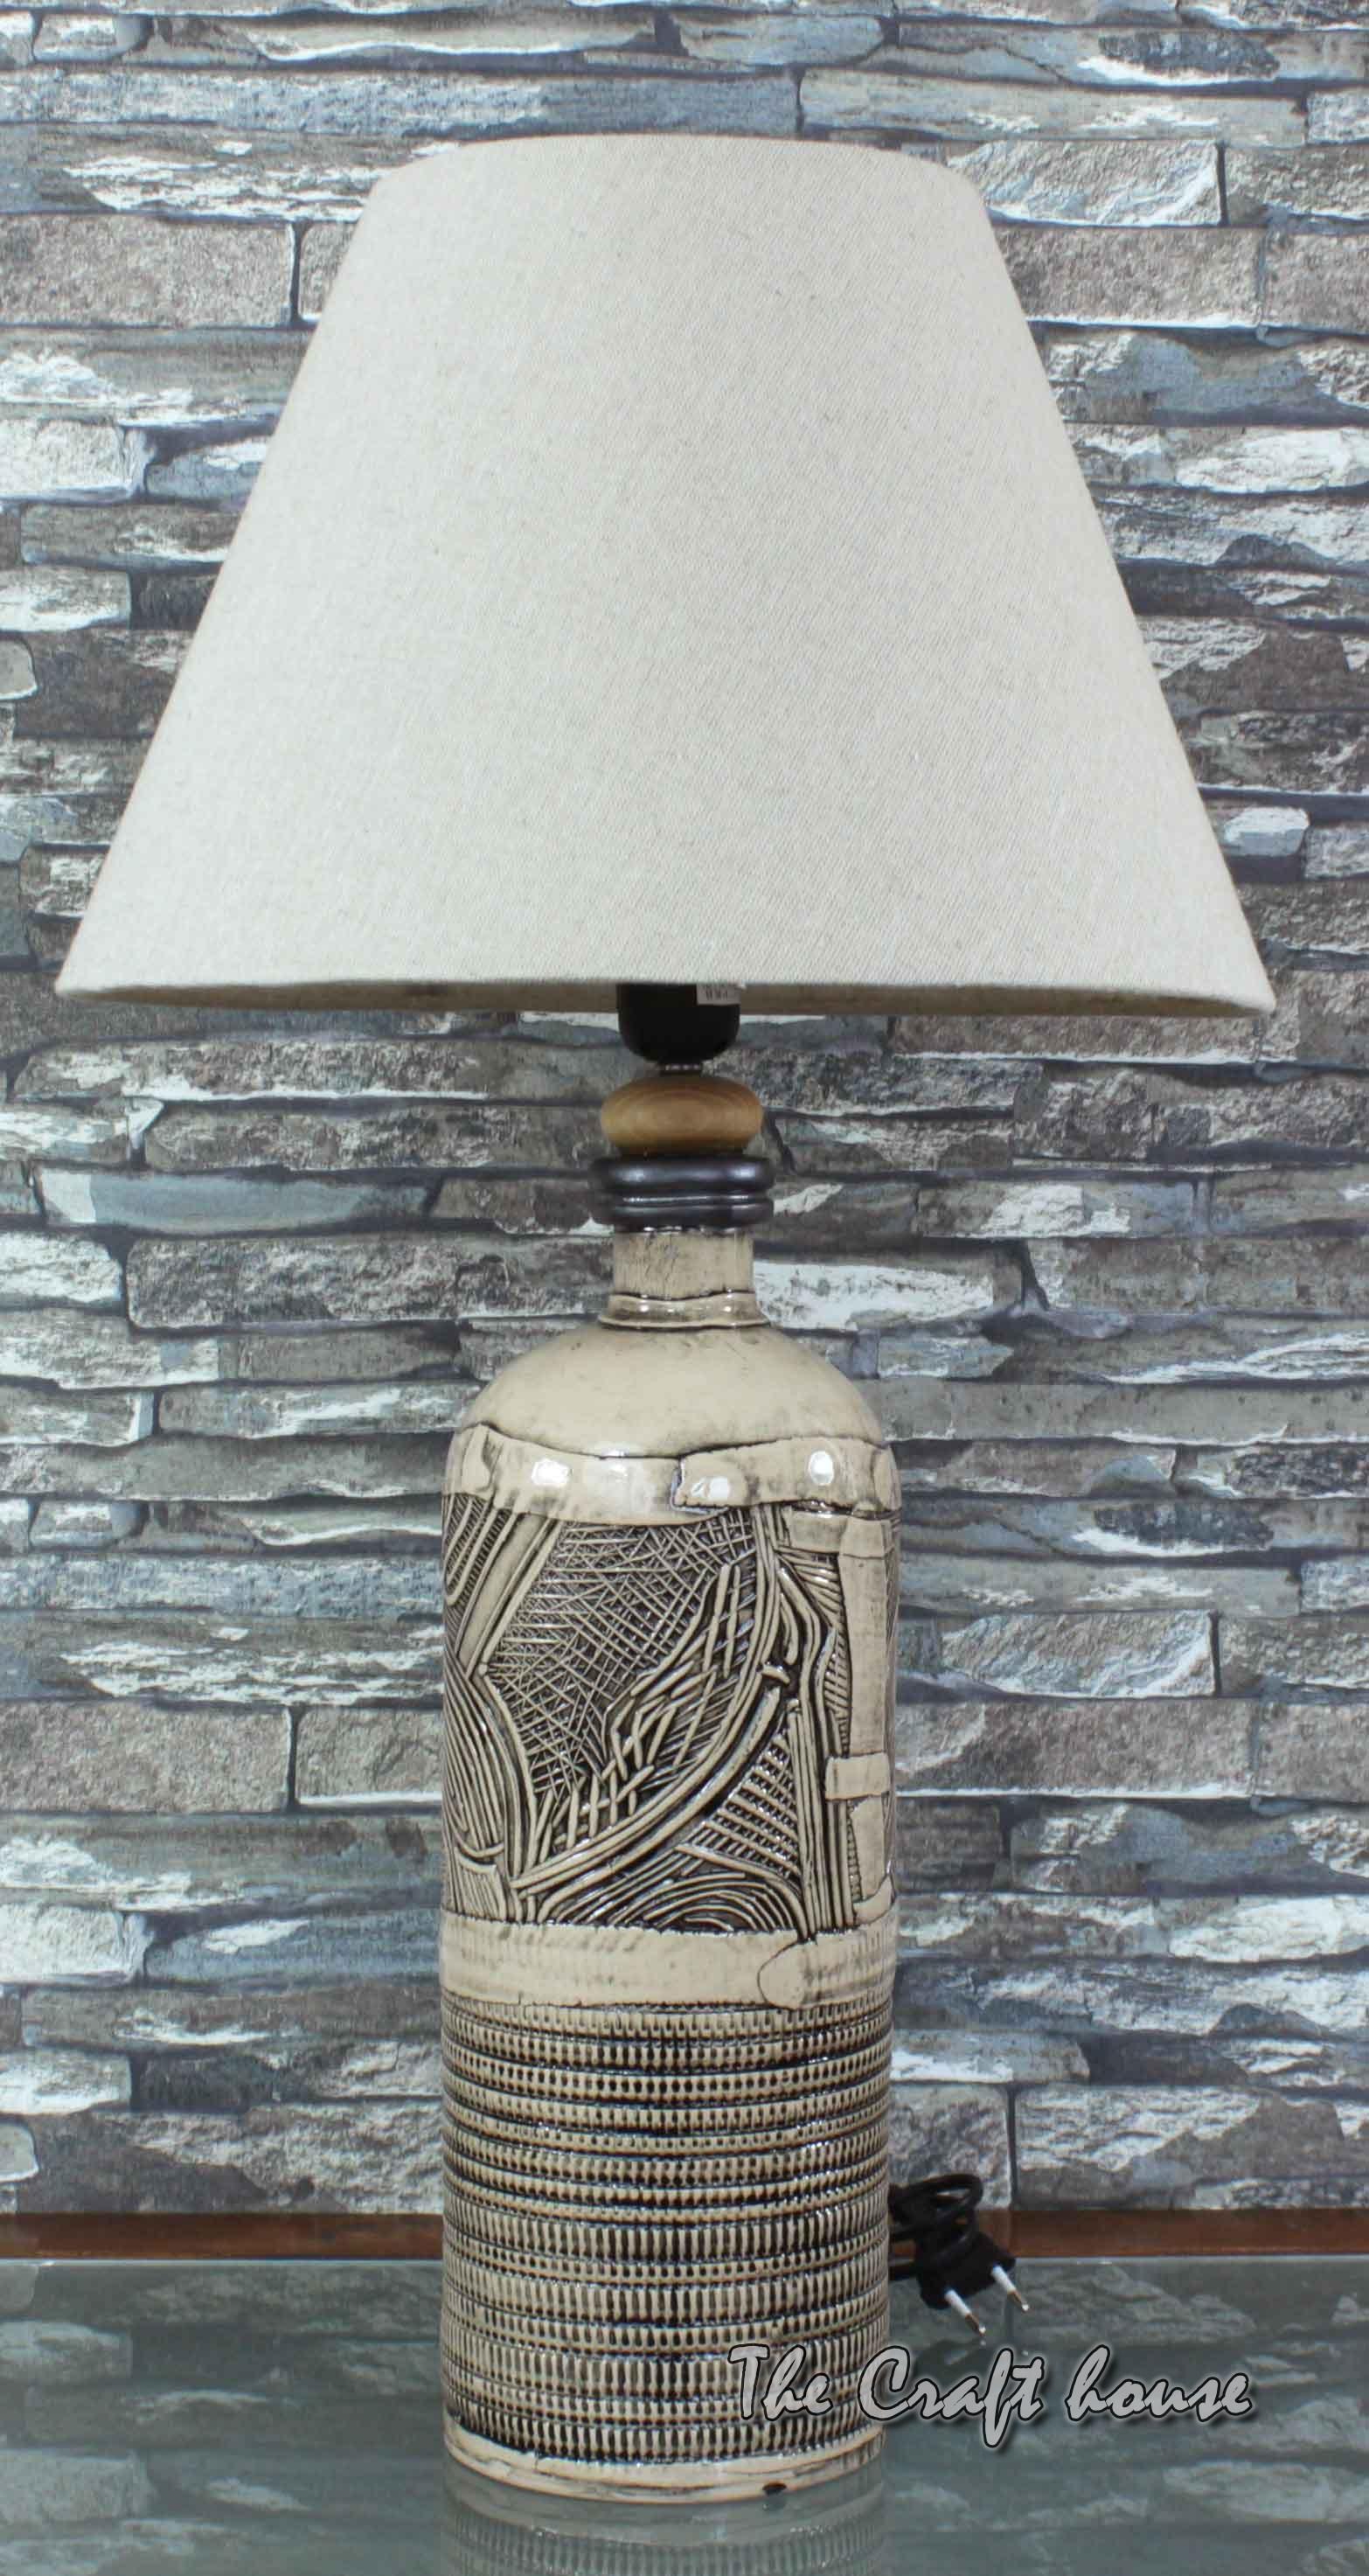 Ceramic art lamp